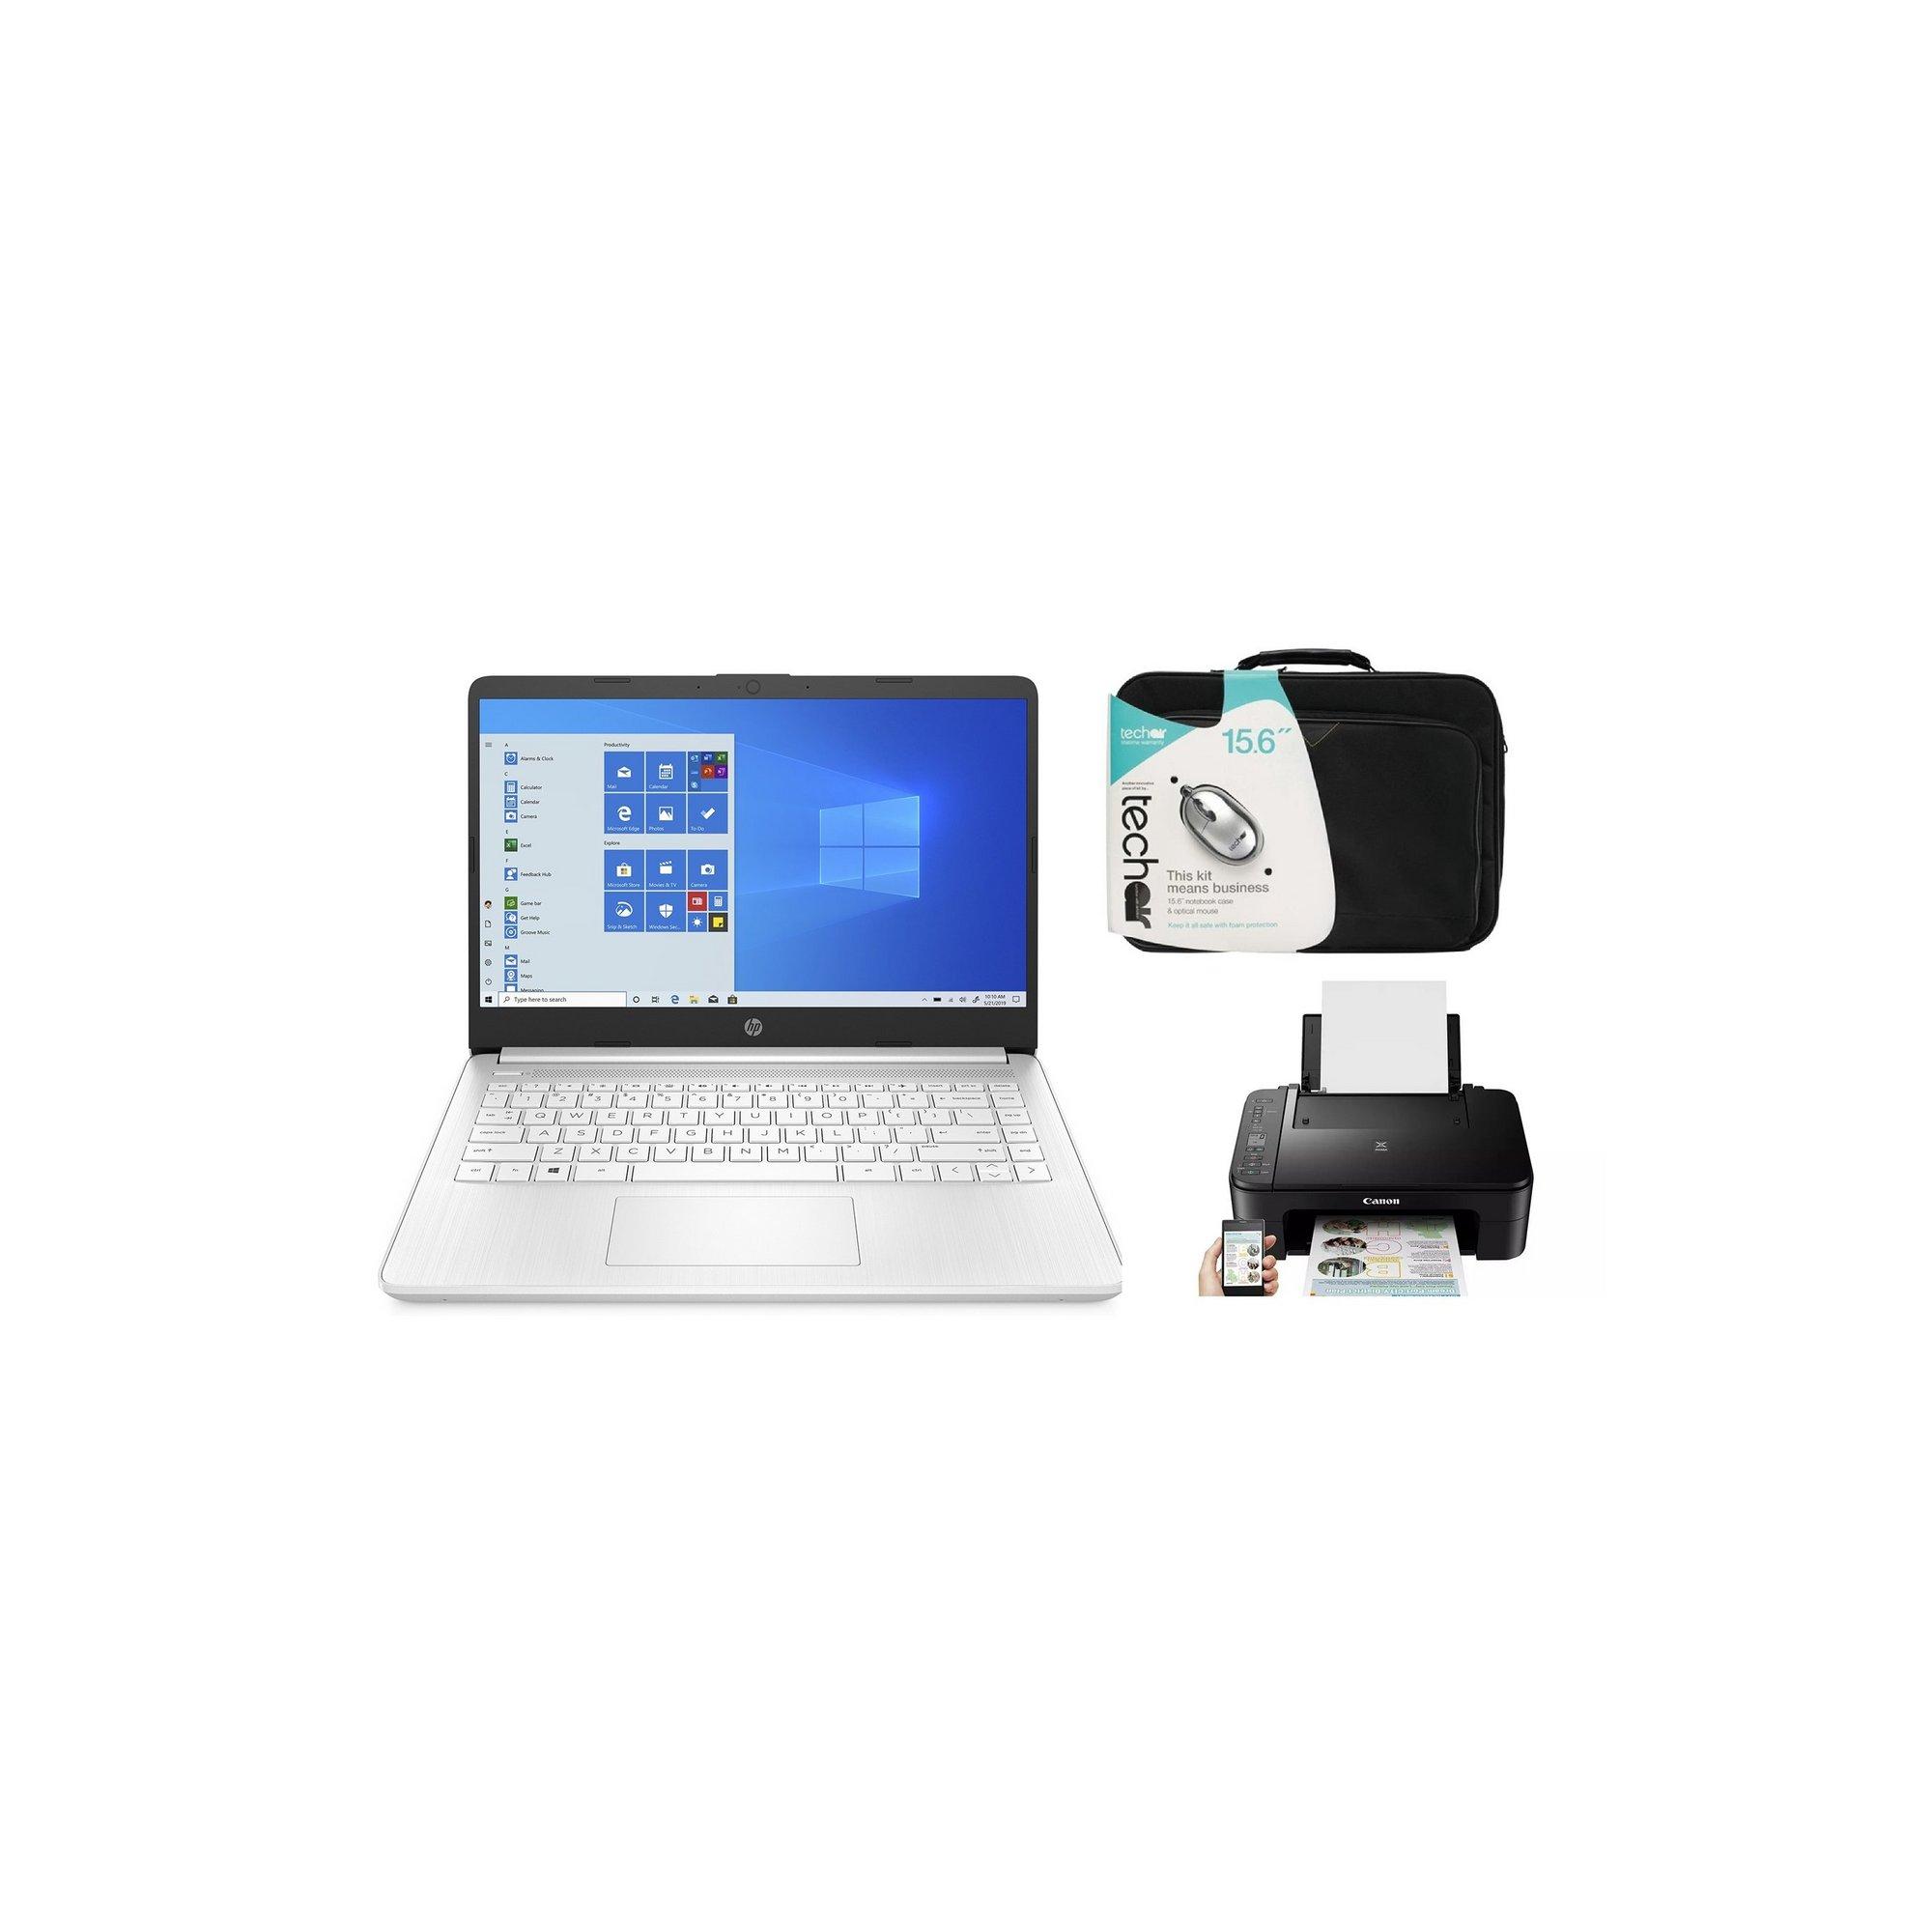 Image of HP 14s-fq0017 AMD 64GB Windows 10 Laptop&#44 Case and Printer Bundle